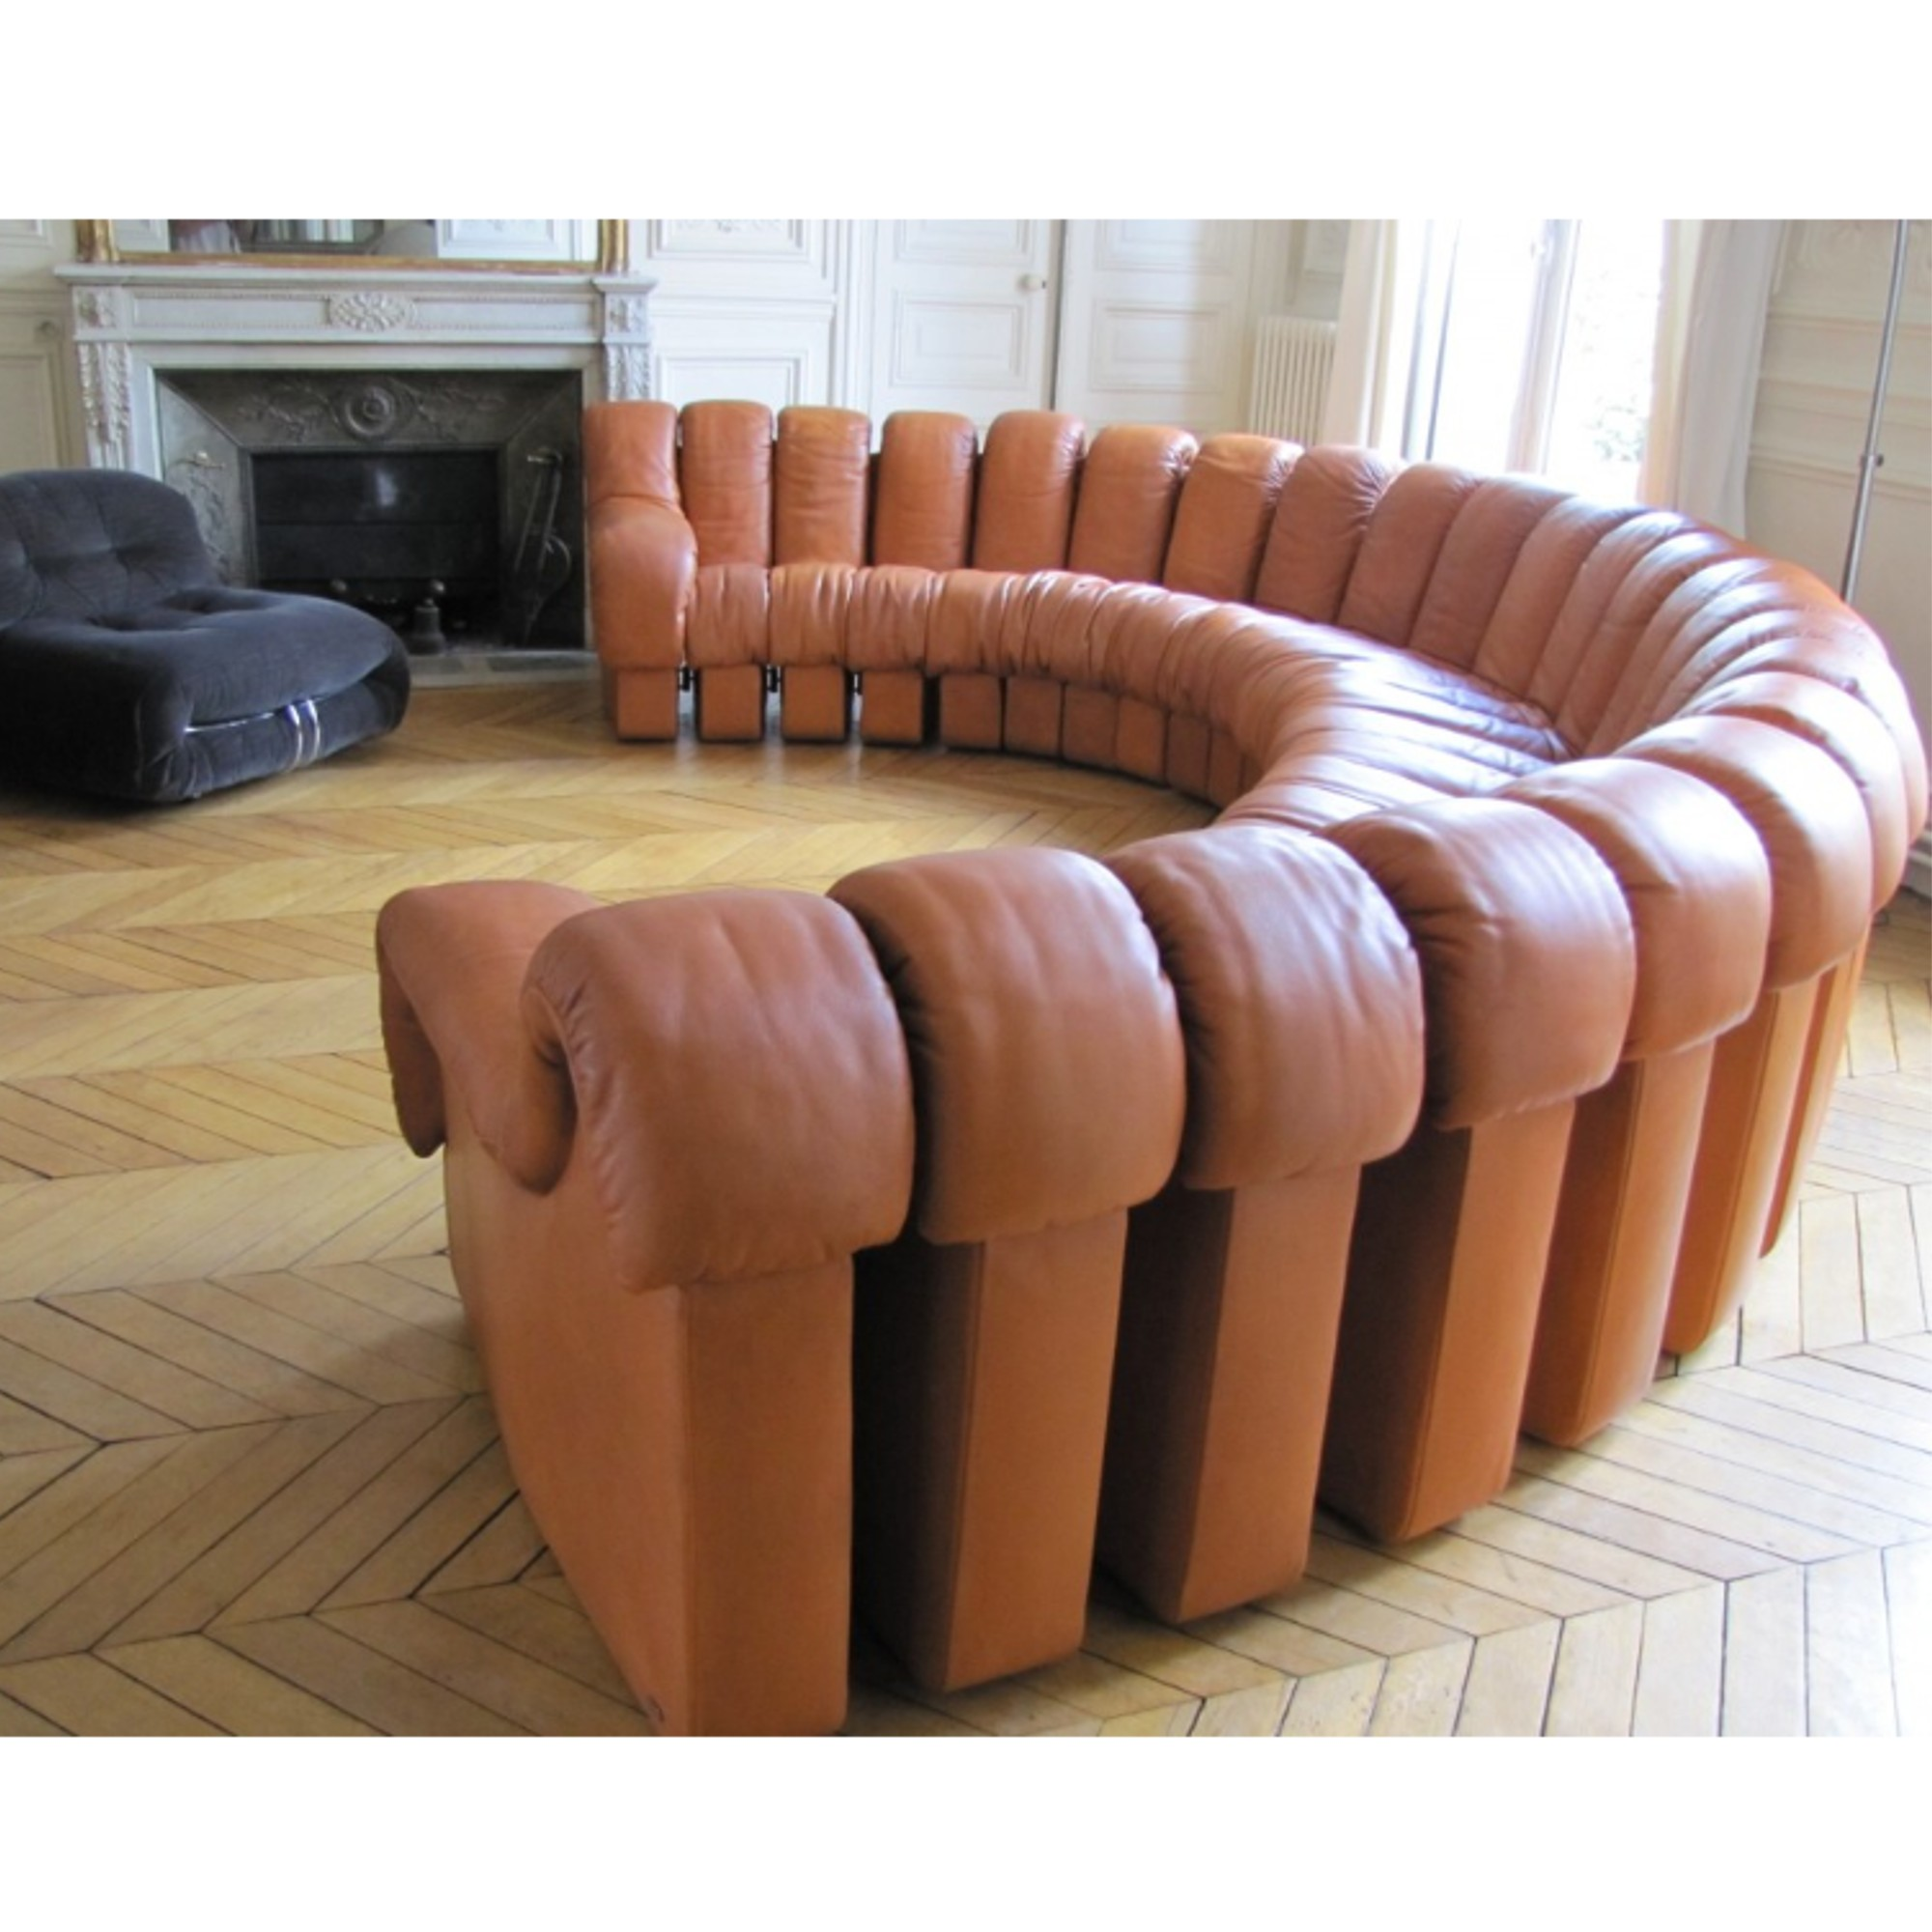 Full Size of De Sede Sofa Preise Usa Uk For Sale Gebraucht Kaufen Leder Sessel Preis Preisliste Bed Furniture Endless Ds 600 By Bi 47 Outlet Modular Sofas Corner Armchairs Sofa De Sede Sofa